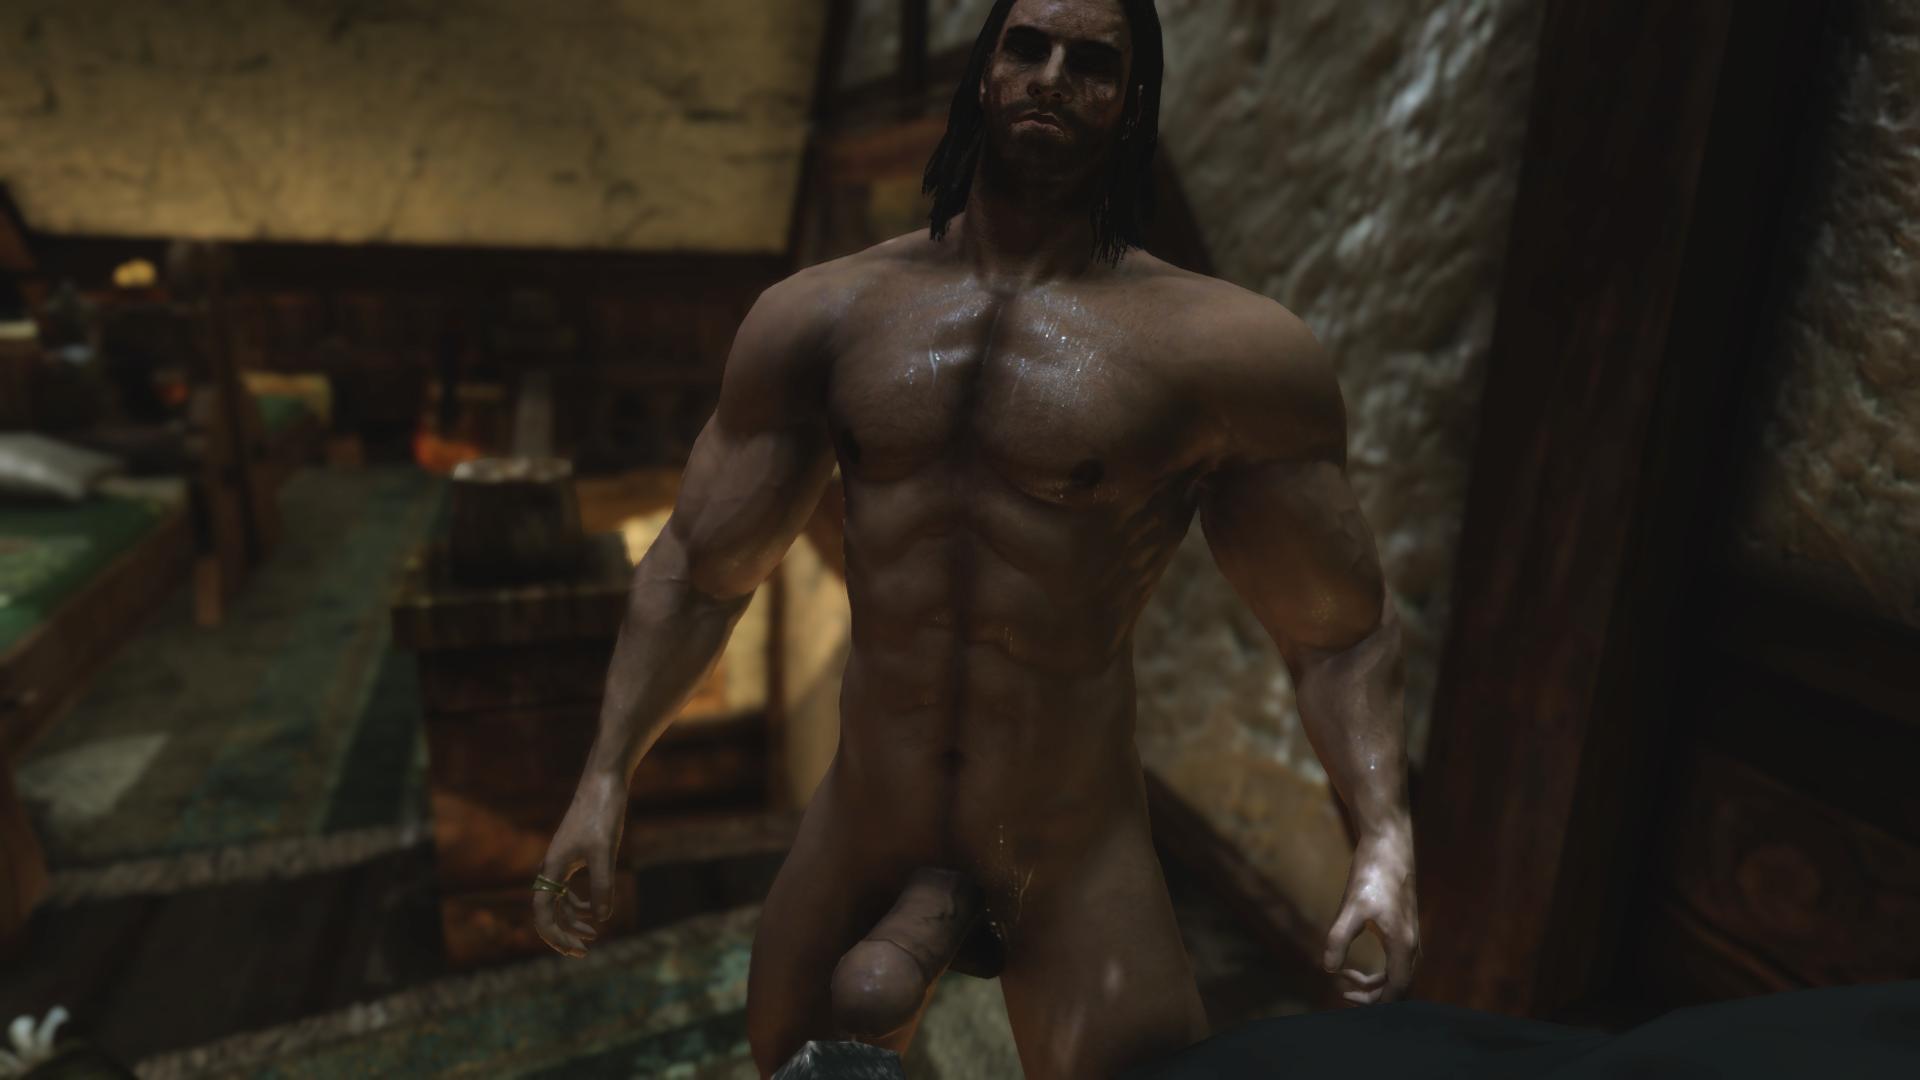 Elderscrolls henti adult photos